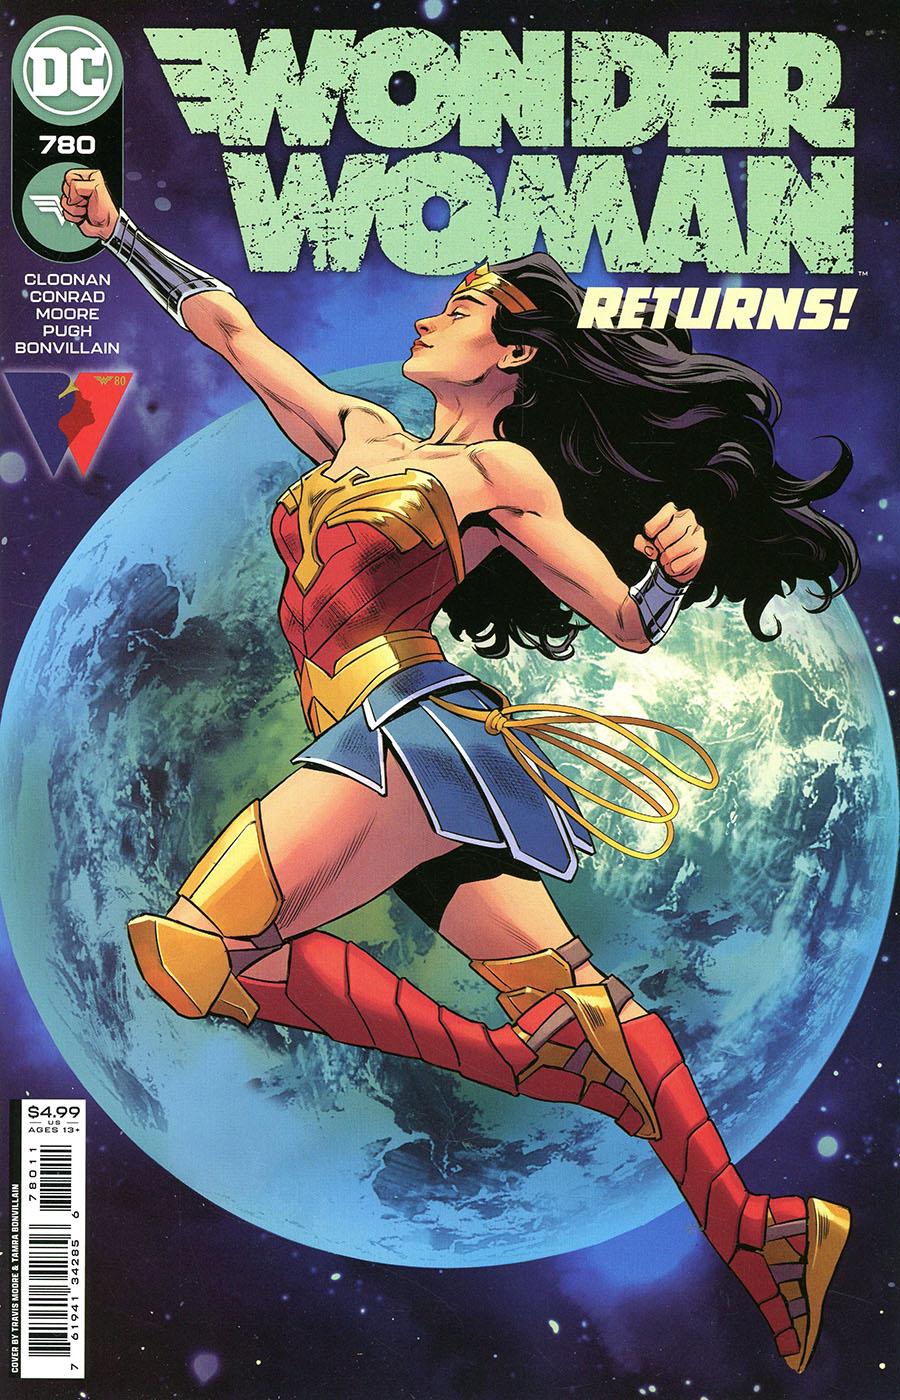 Wonder Woman Vol 5 #780 Cover A Regular Travis Moore Cover